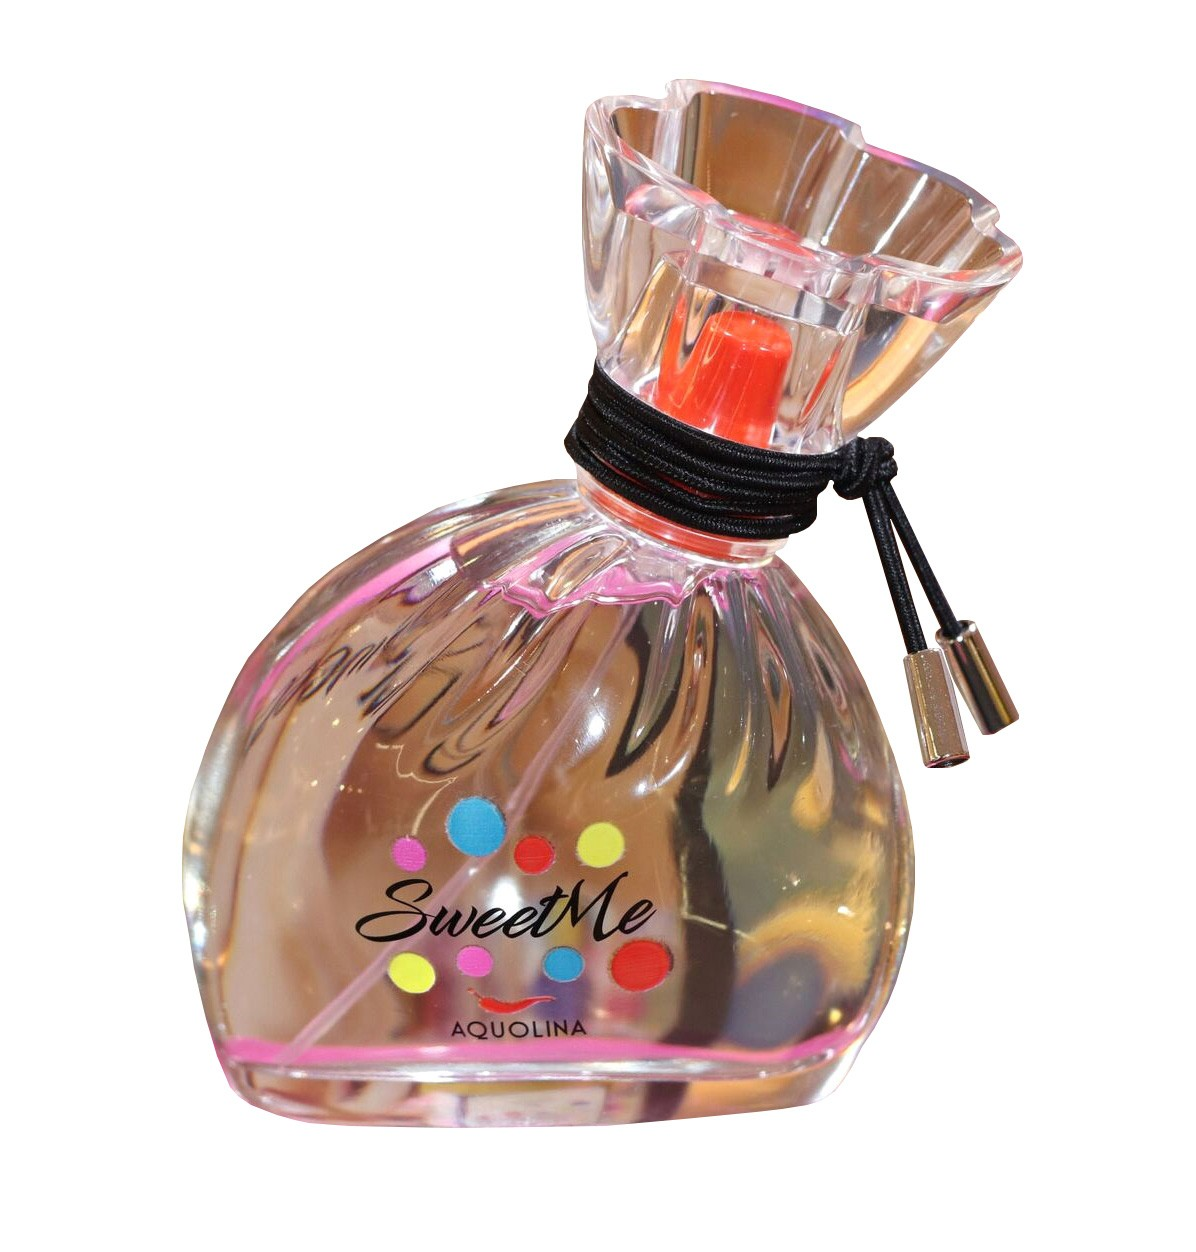 Aquolina Sweet Me аромат для женщин